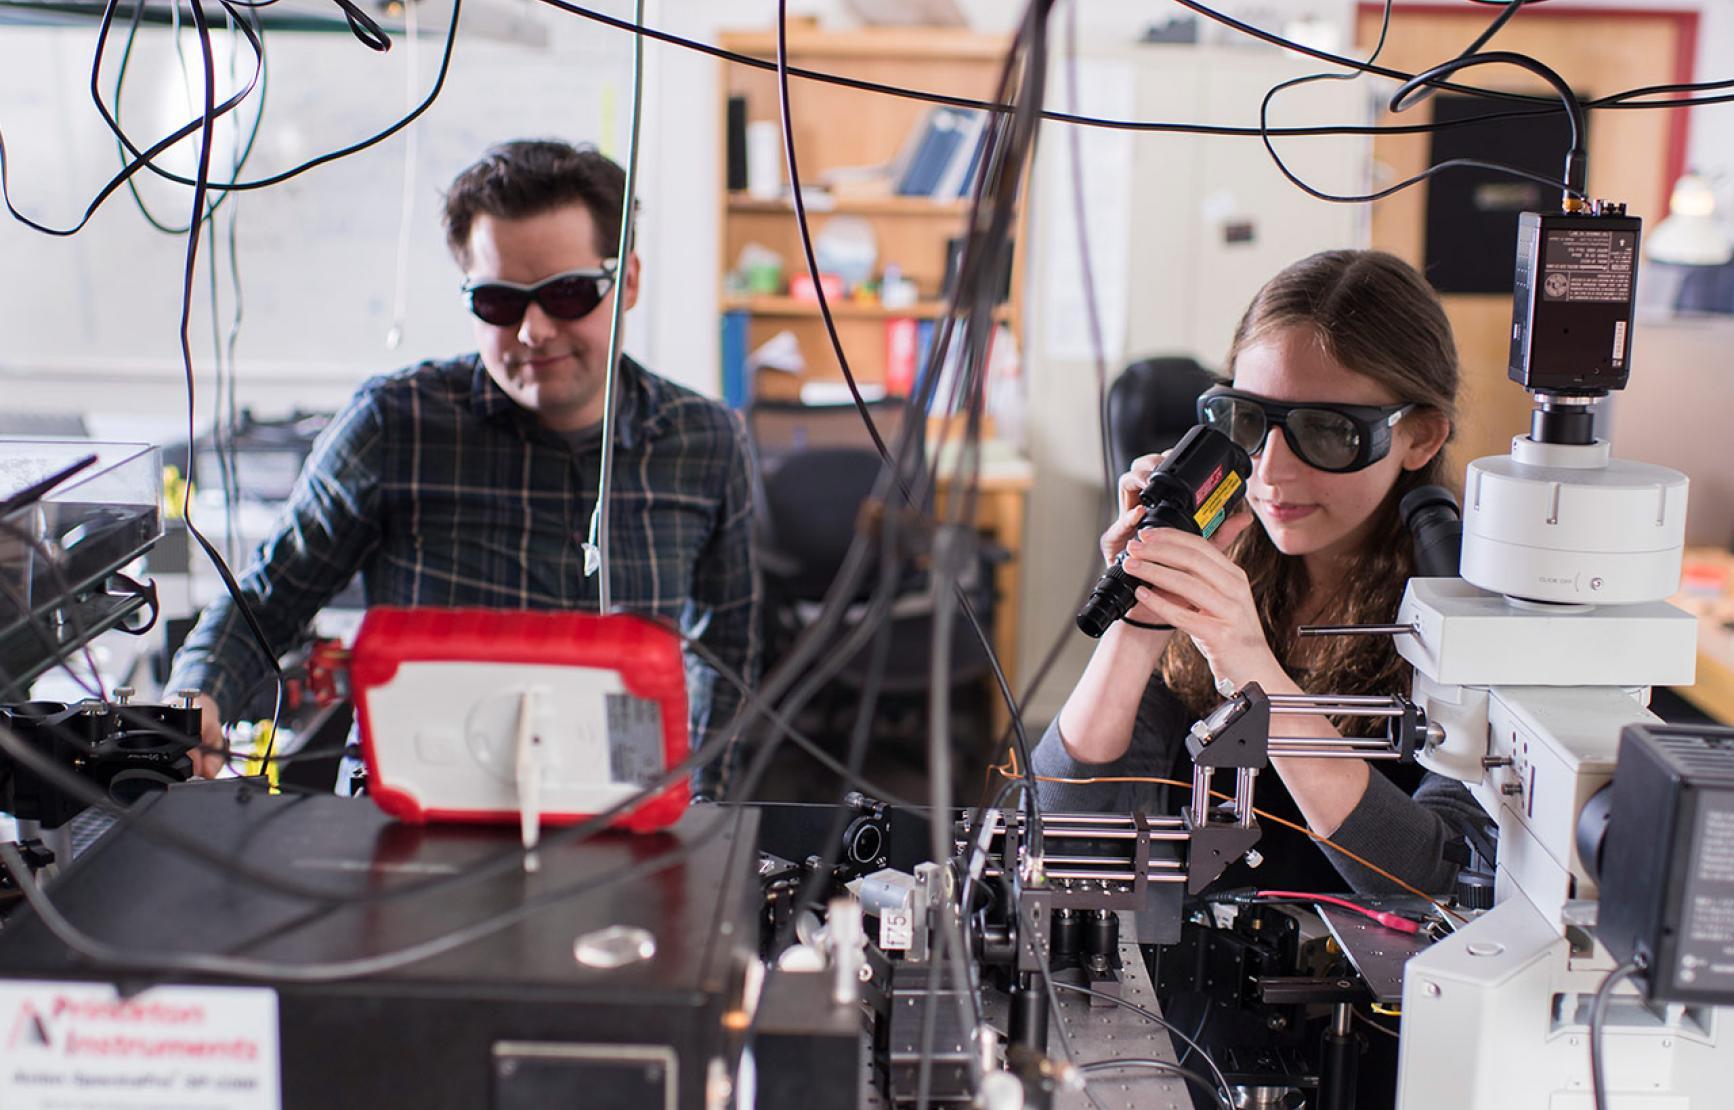 Matt Graham and colleague working in lab.